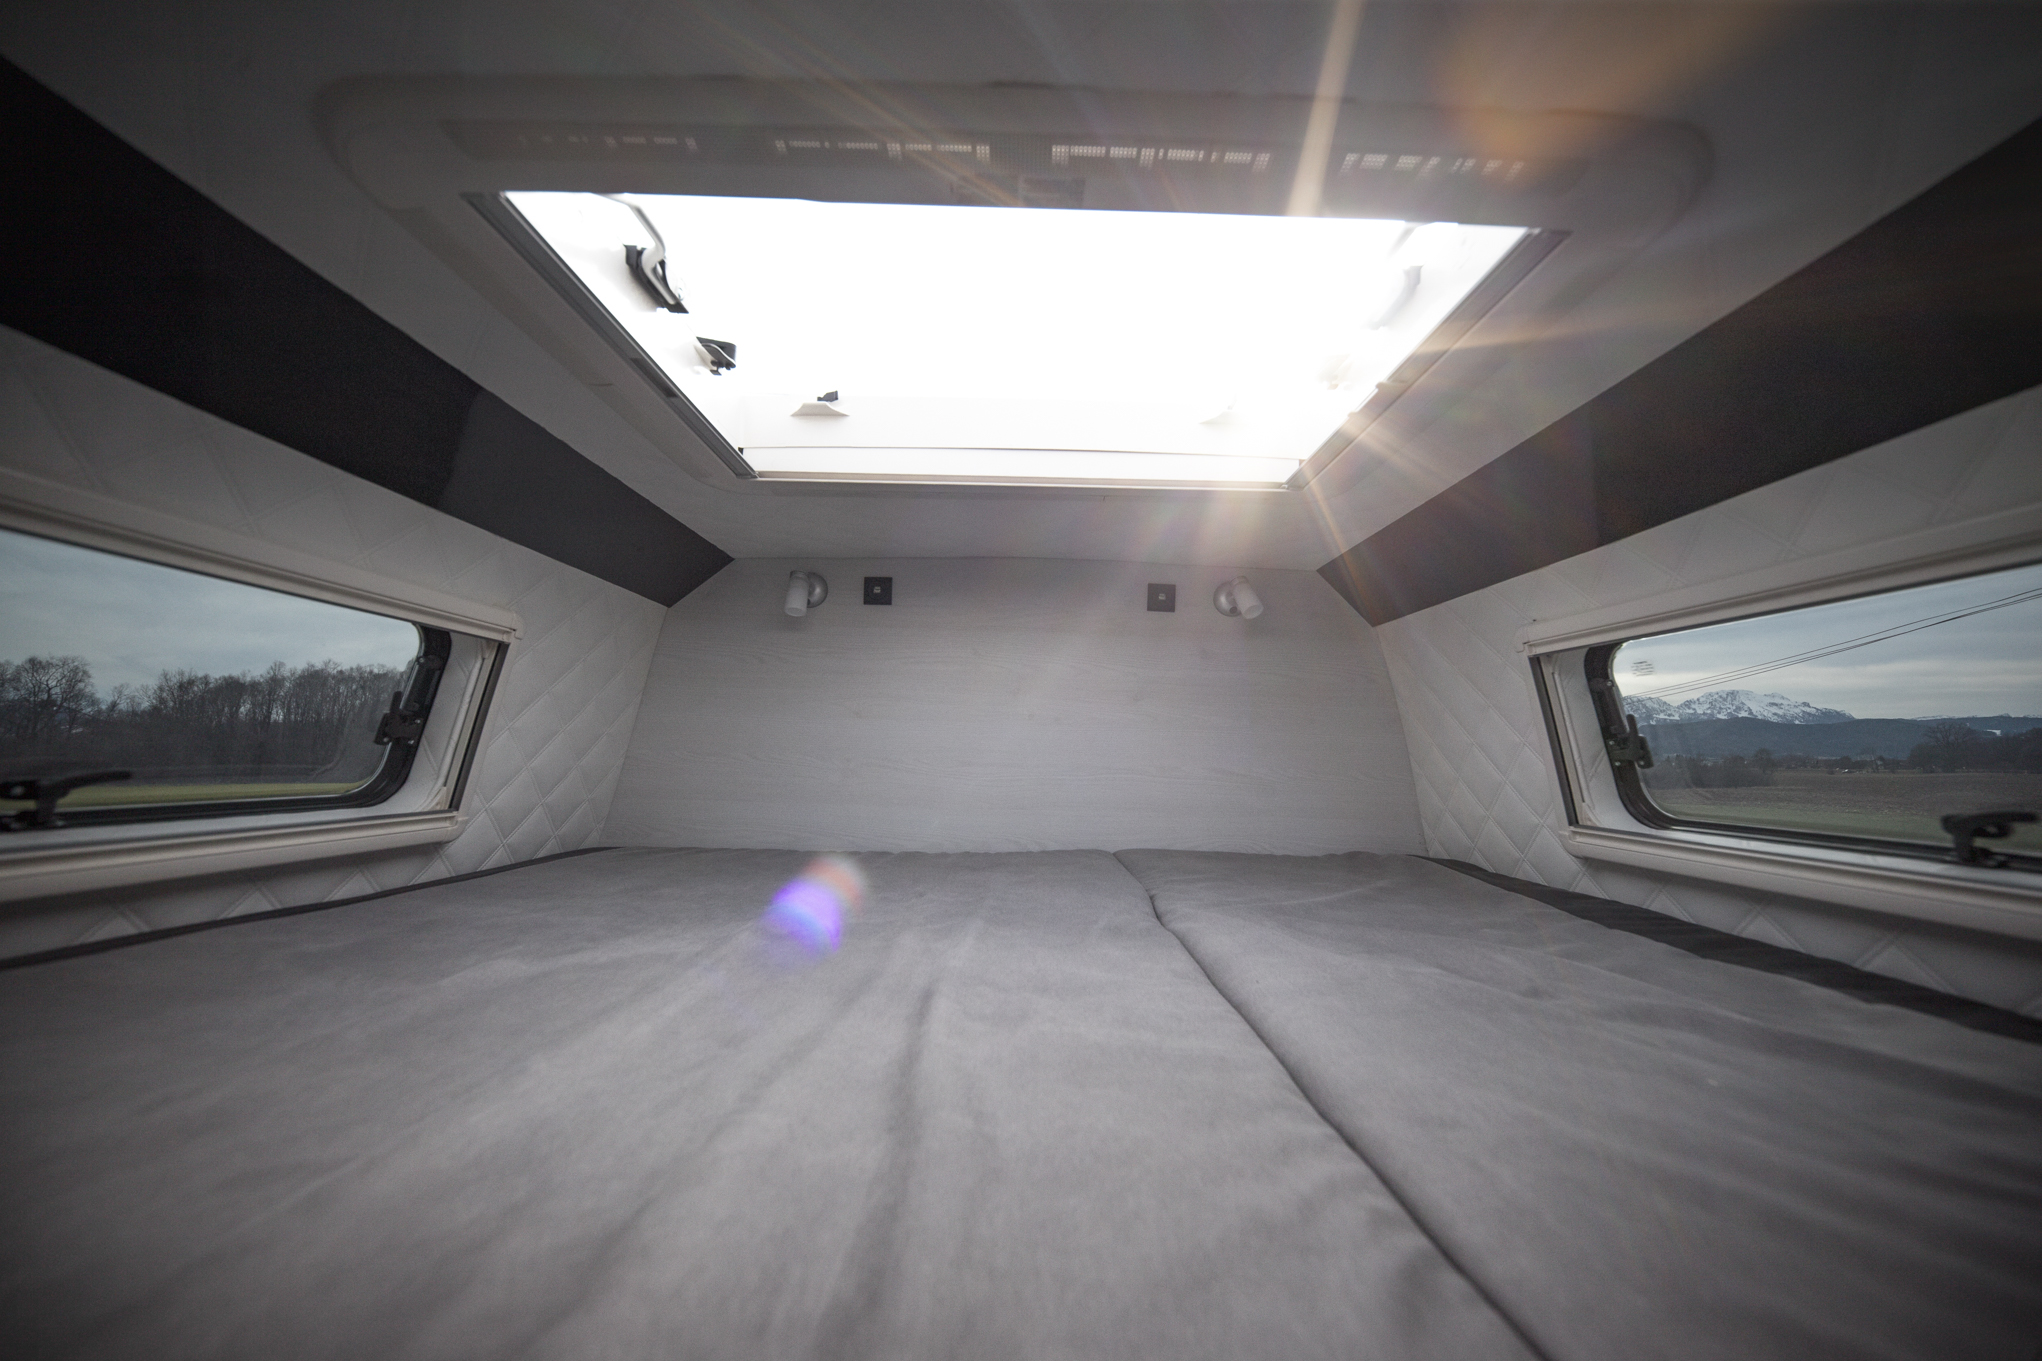 midiheki2 großes dachfenster sternenhimmel bett mit großem fenster seitenfenster vr motorhomes